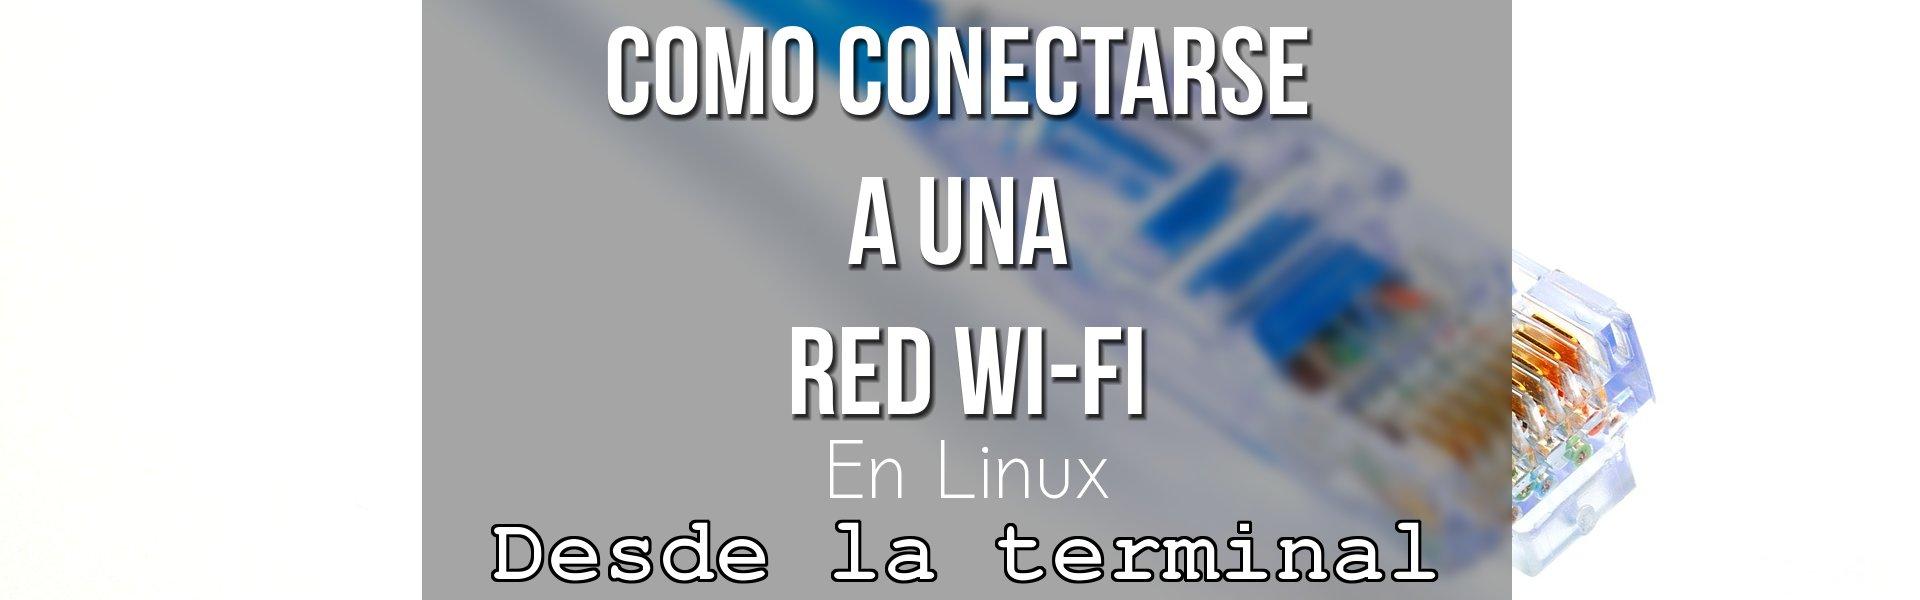 Conectarse a red Wi-Fi desde terminal